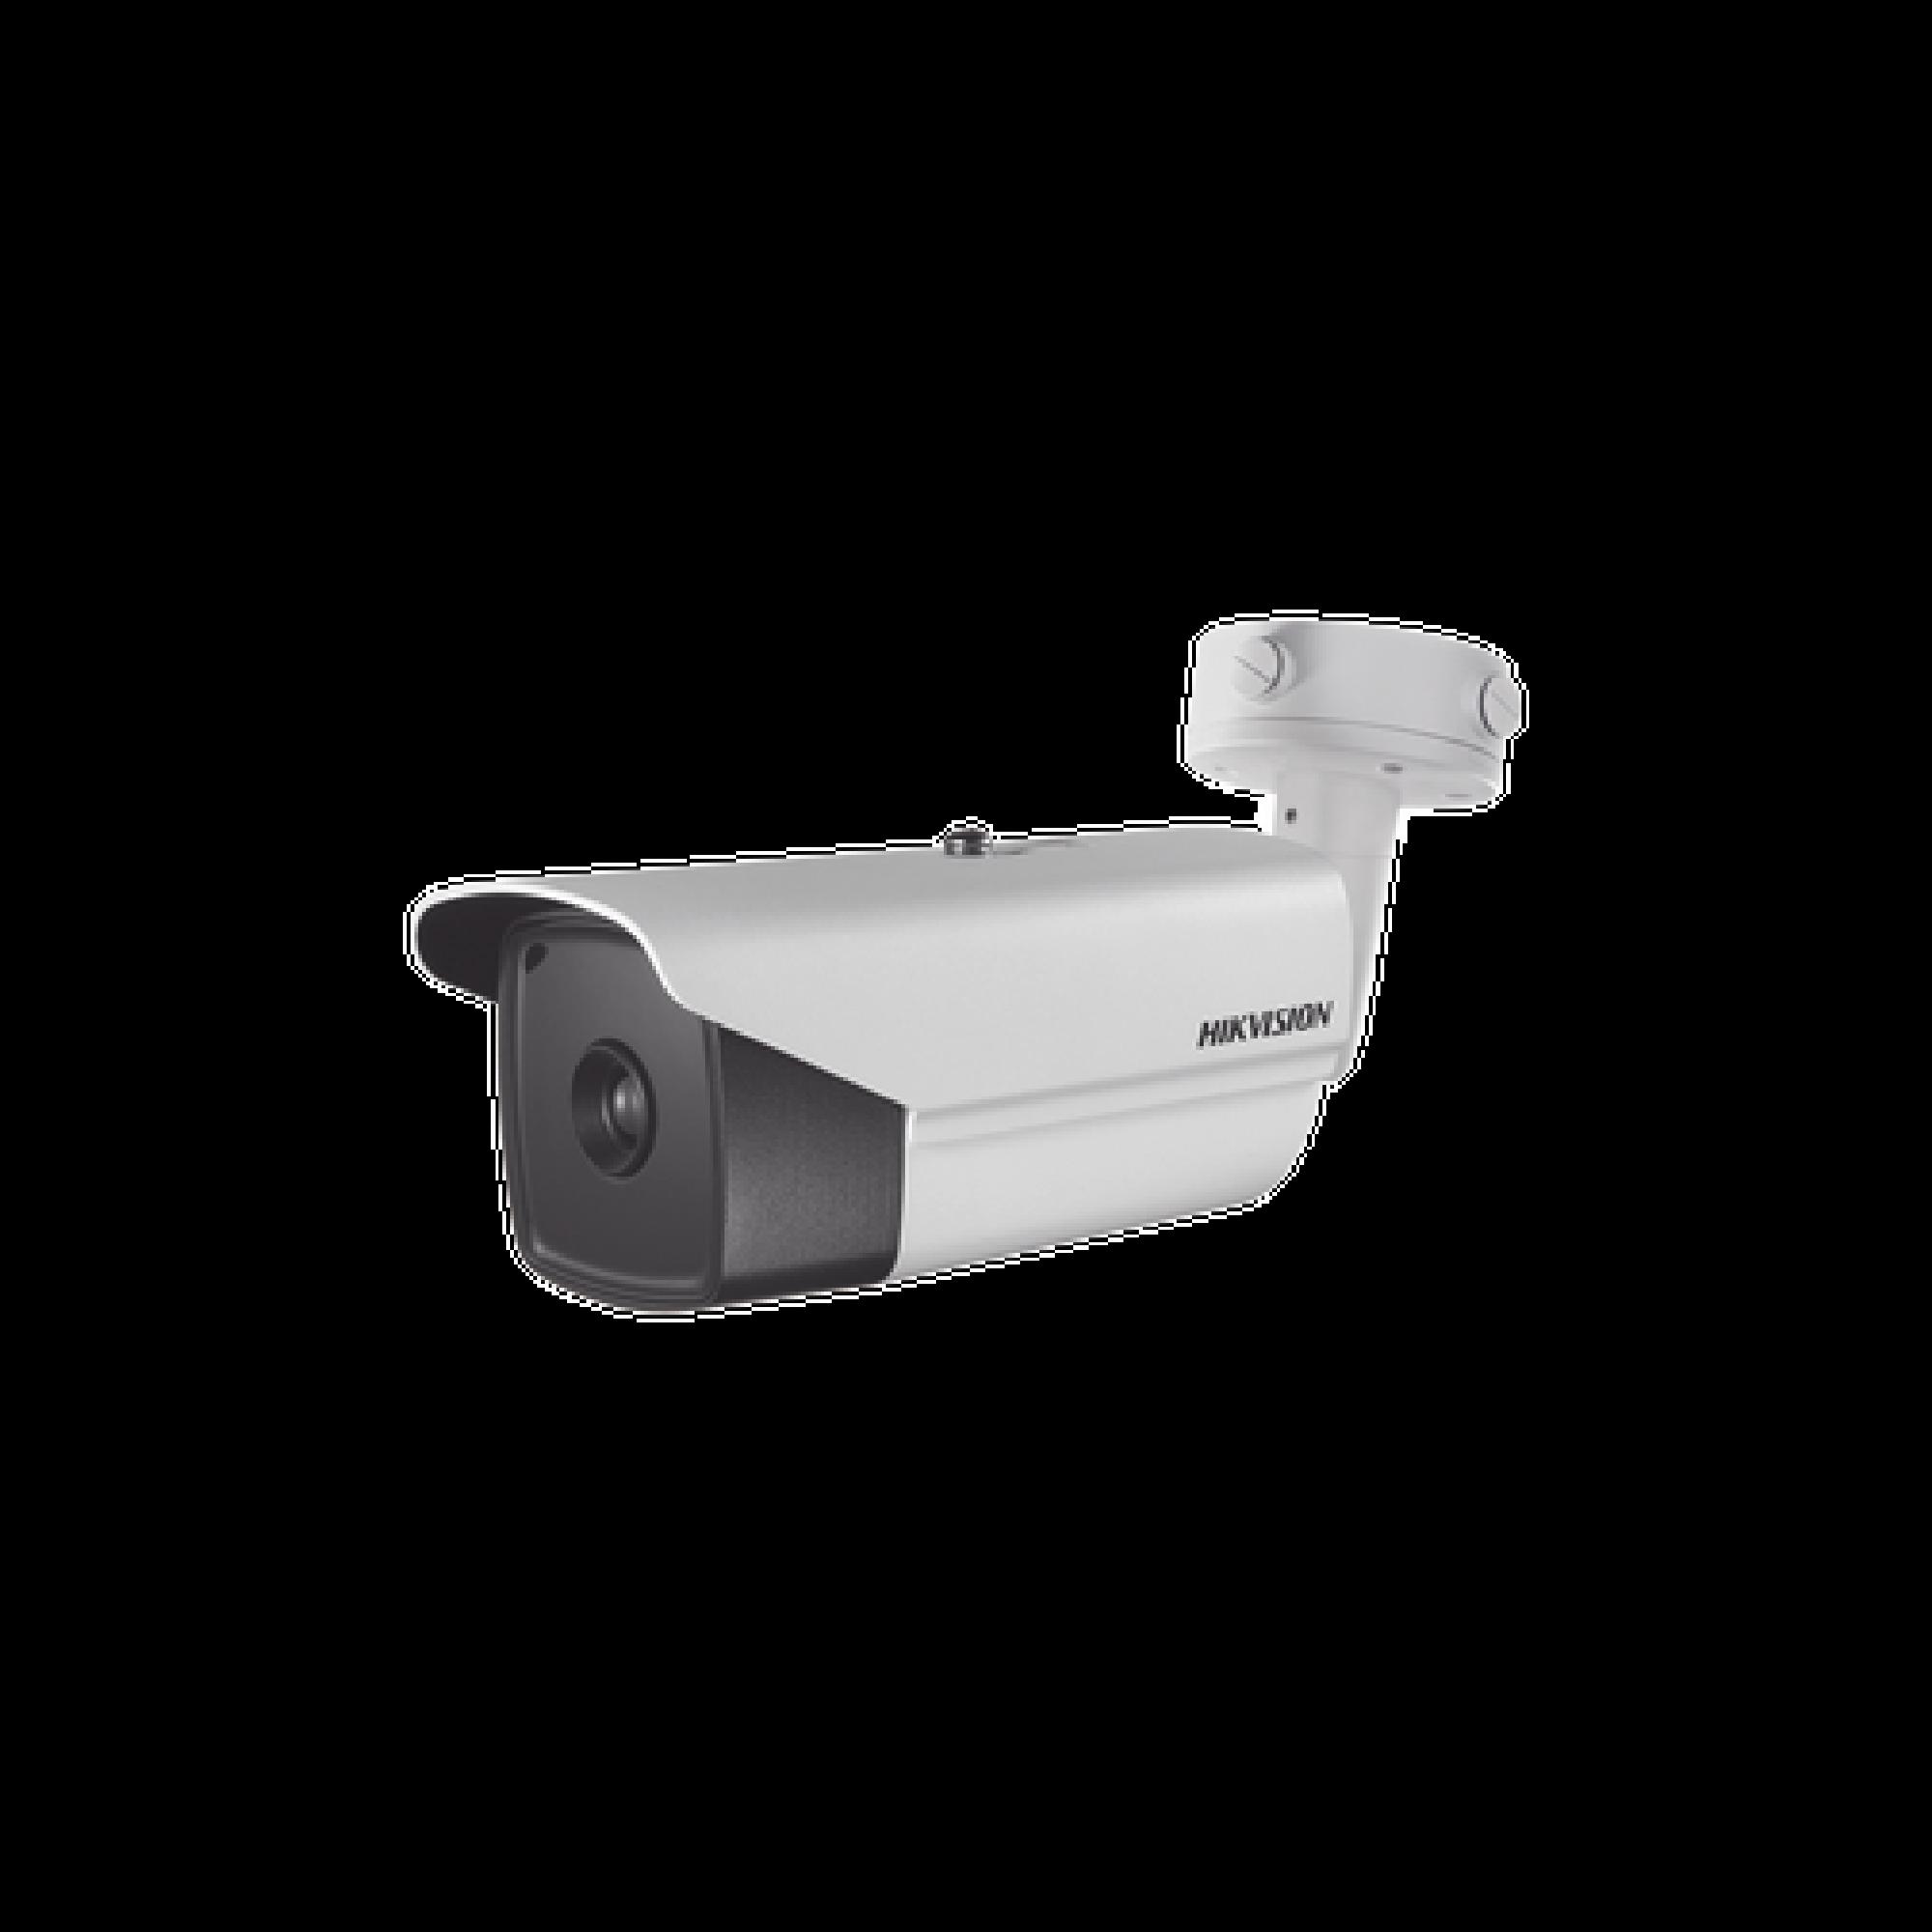 Bala IP Termica 640 X 512 / Lente 35 mm / Termometrica / Deteccion de Temperatura / PoE+ / IP66